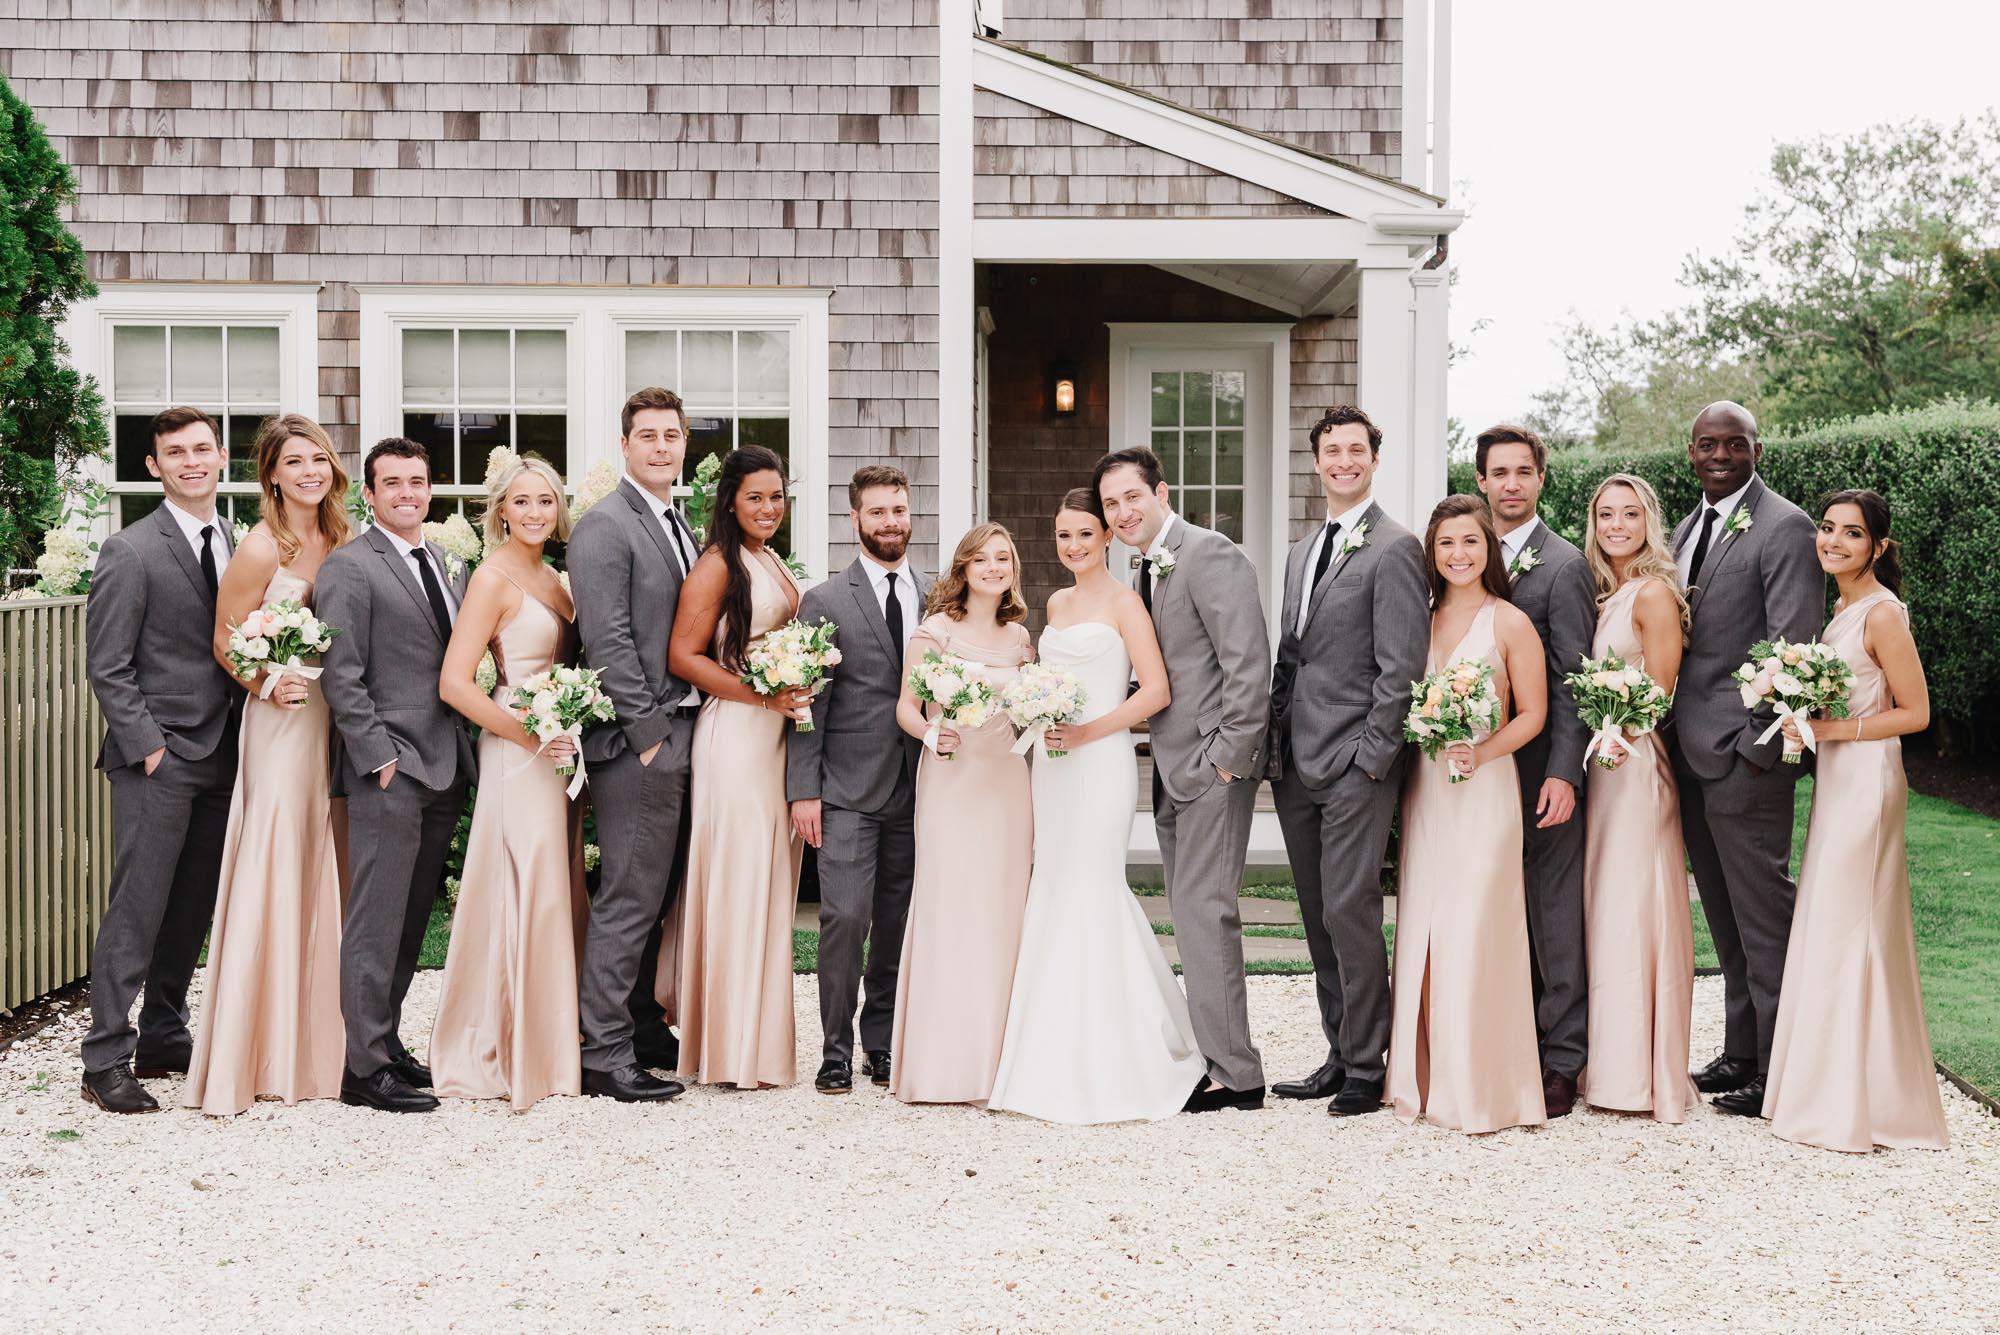 Galley Beach wedding party